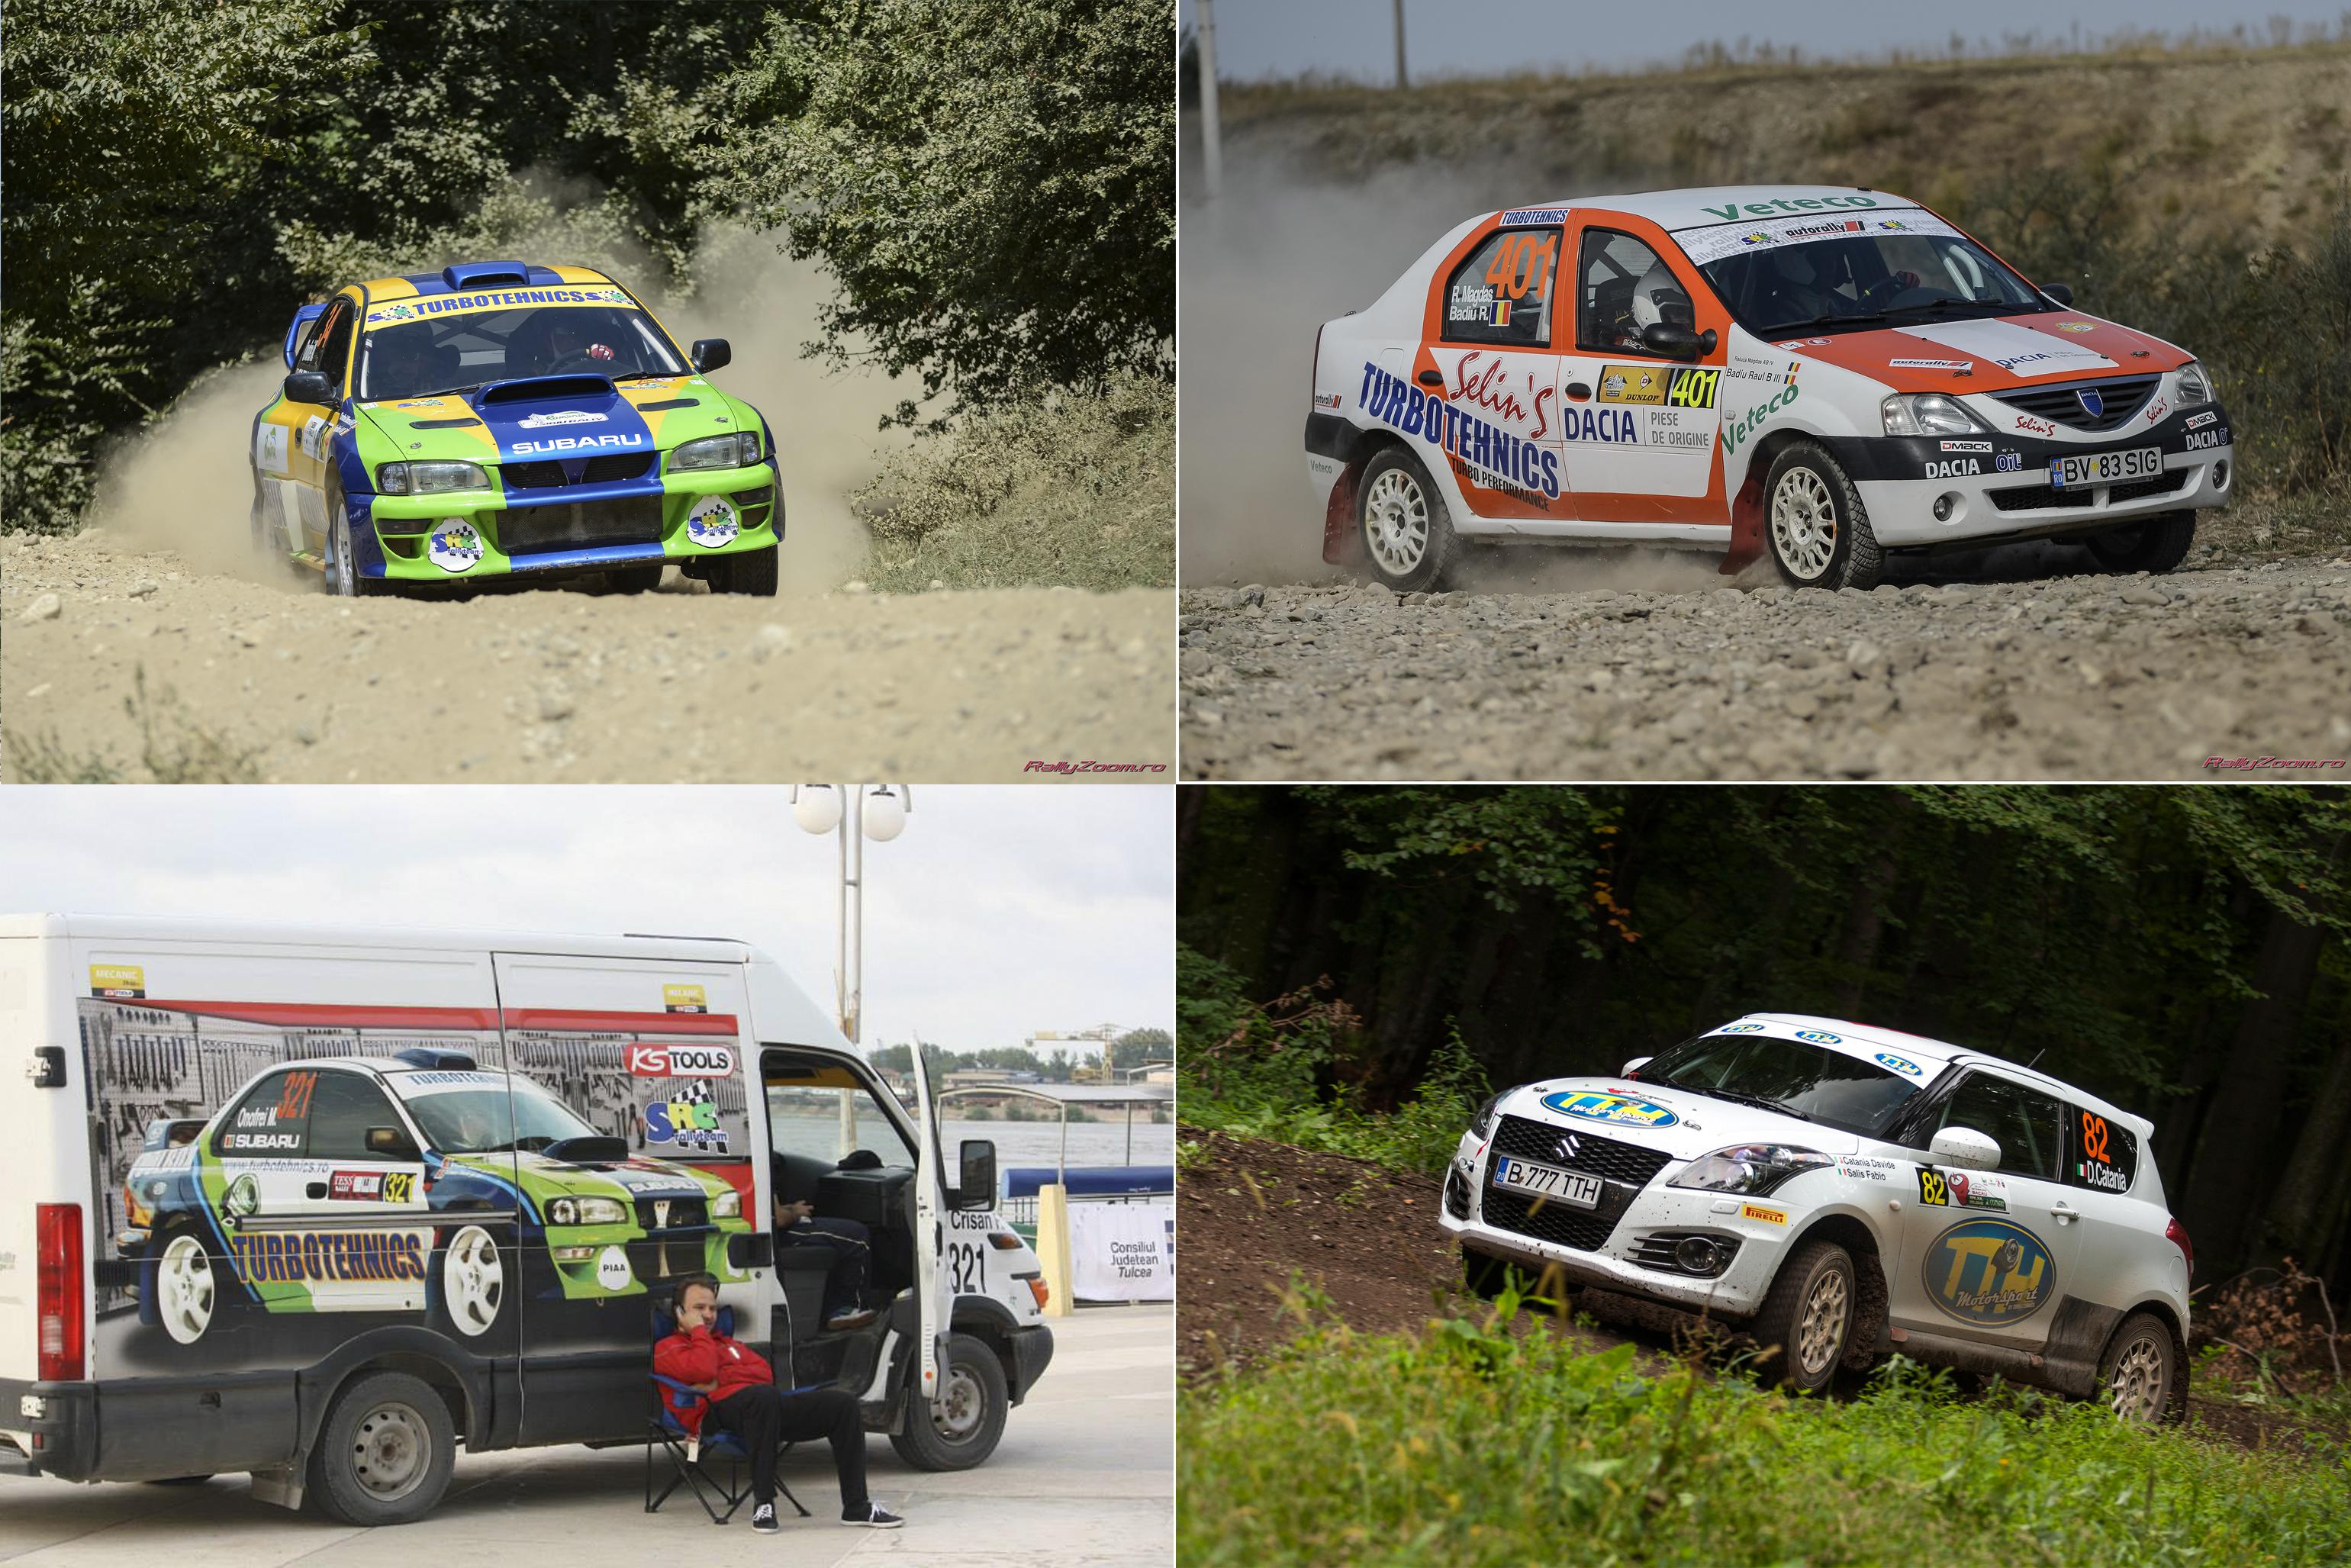 De vanzare Subaru Impreza STi, Dacia Logan, Suzuki Swift Sport si duba asistenta Iveco